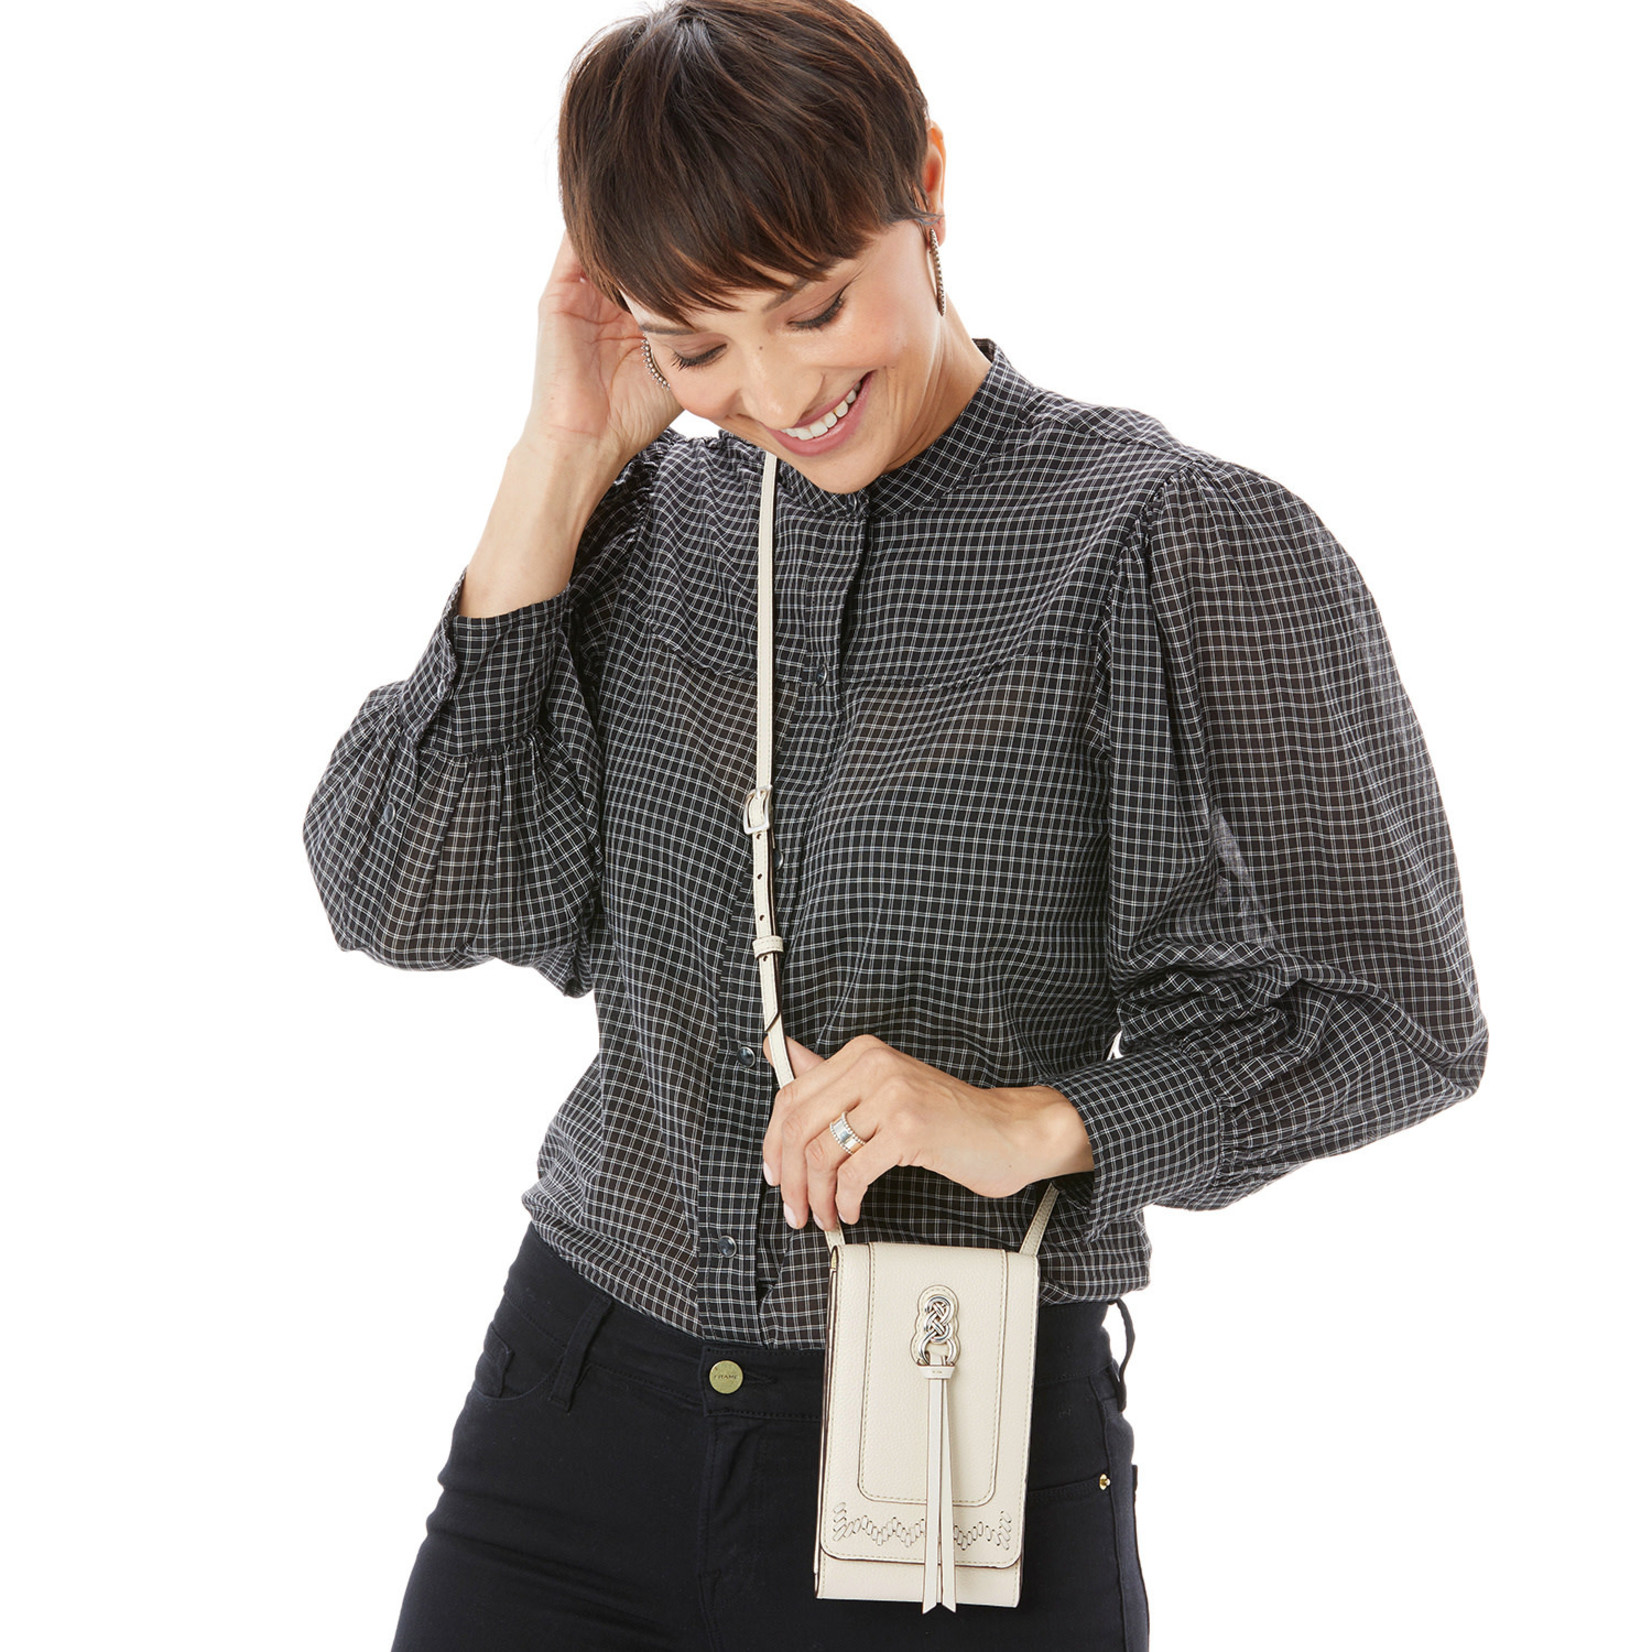 Brighton E53763 Interlok Phone Organizer - Black